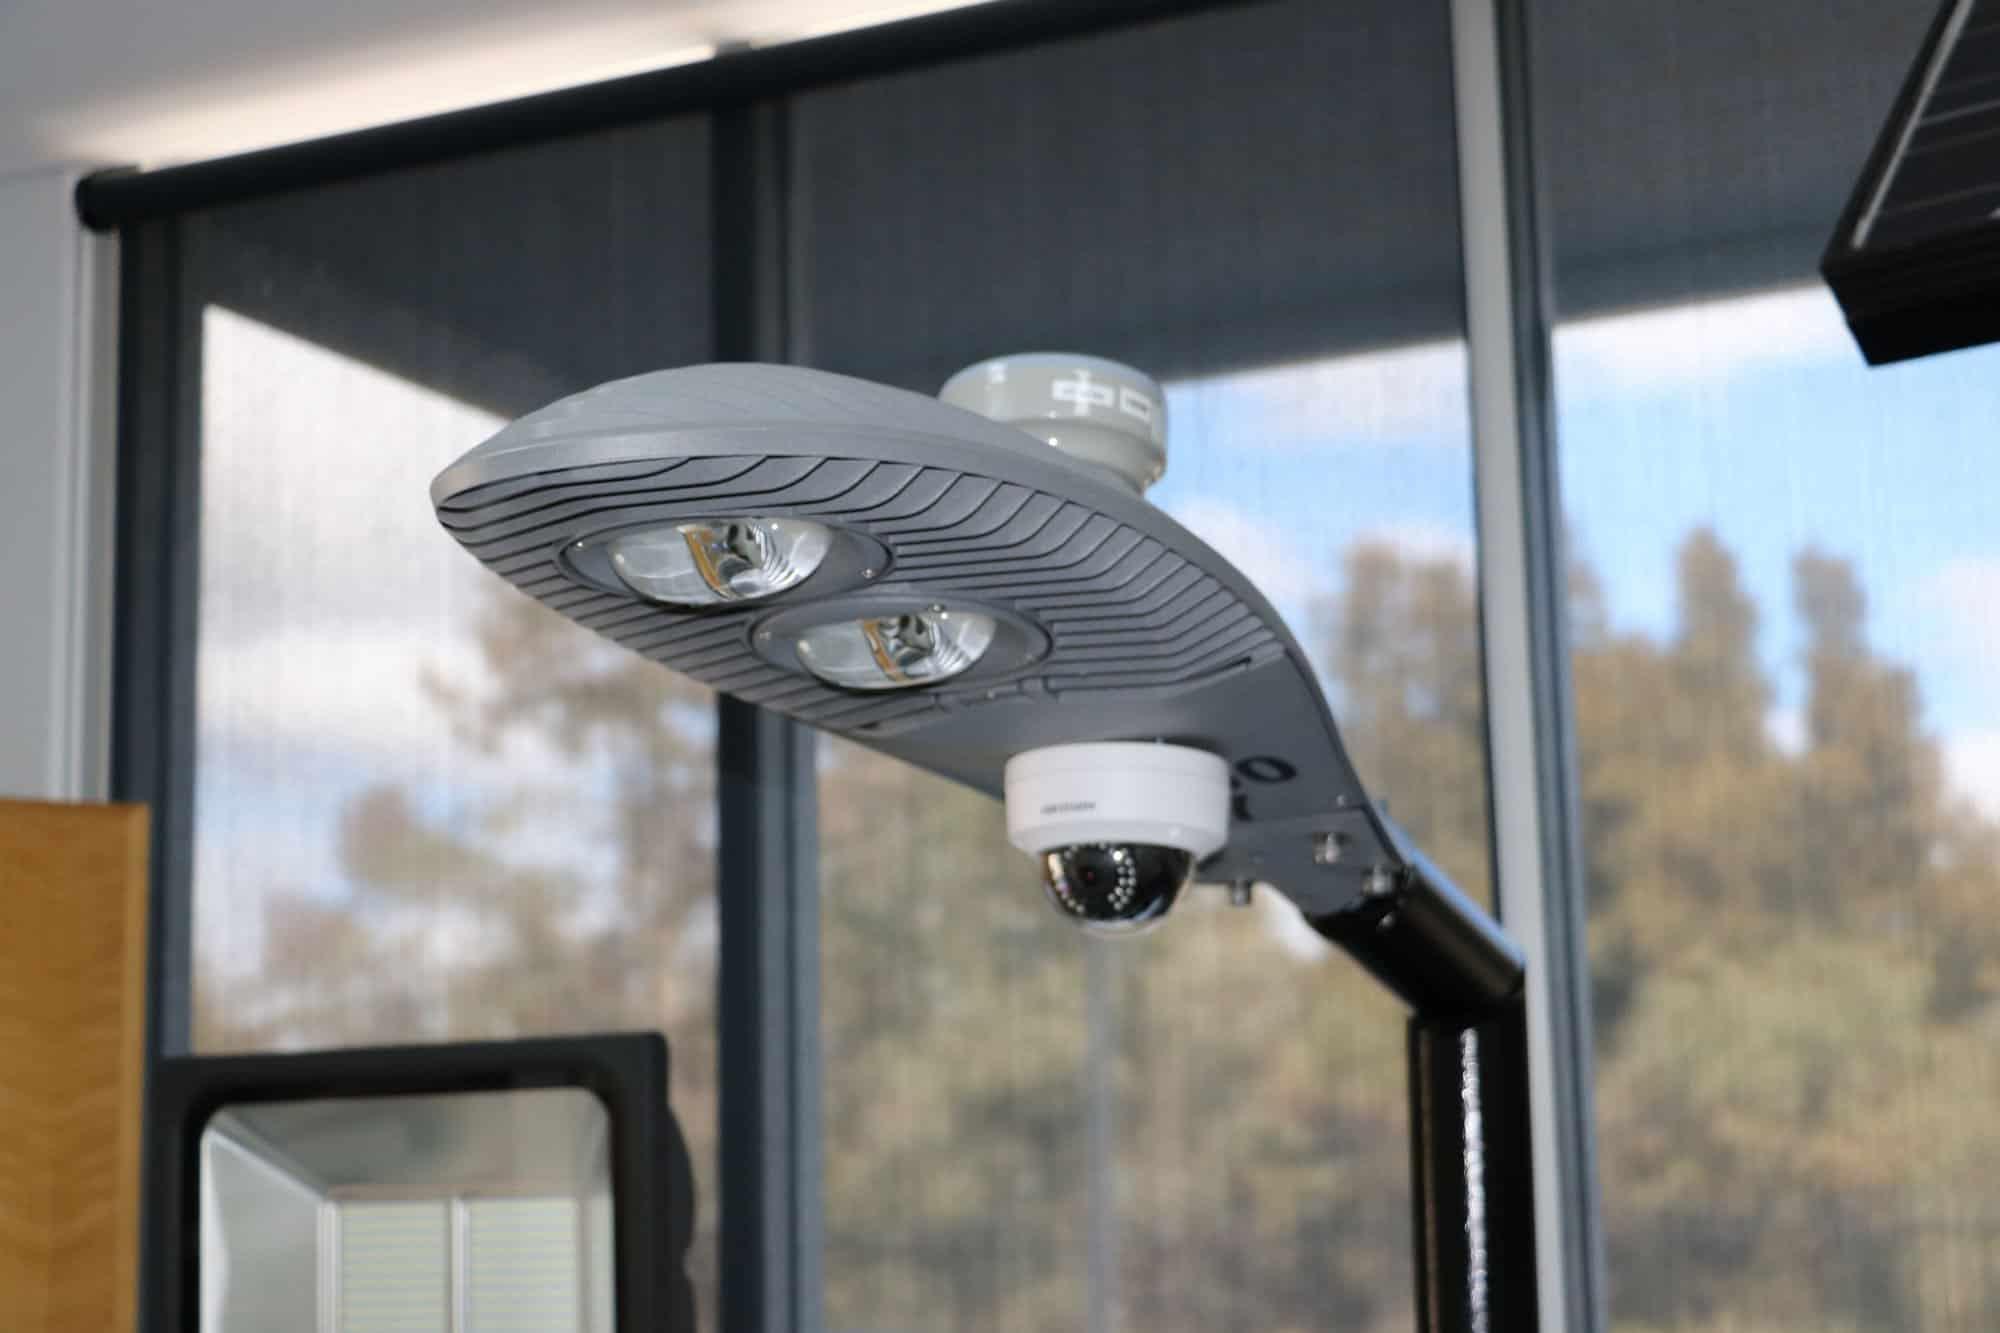 CCTV security camera on Sentinel 100w